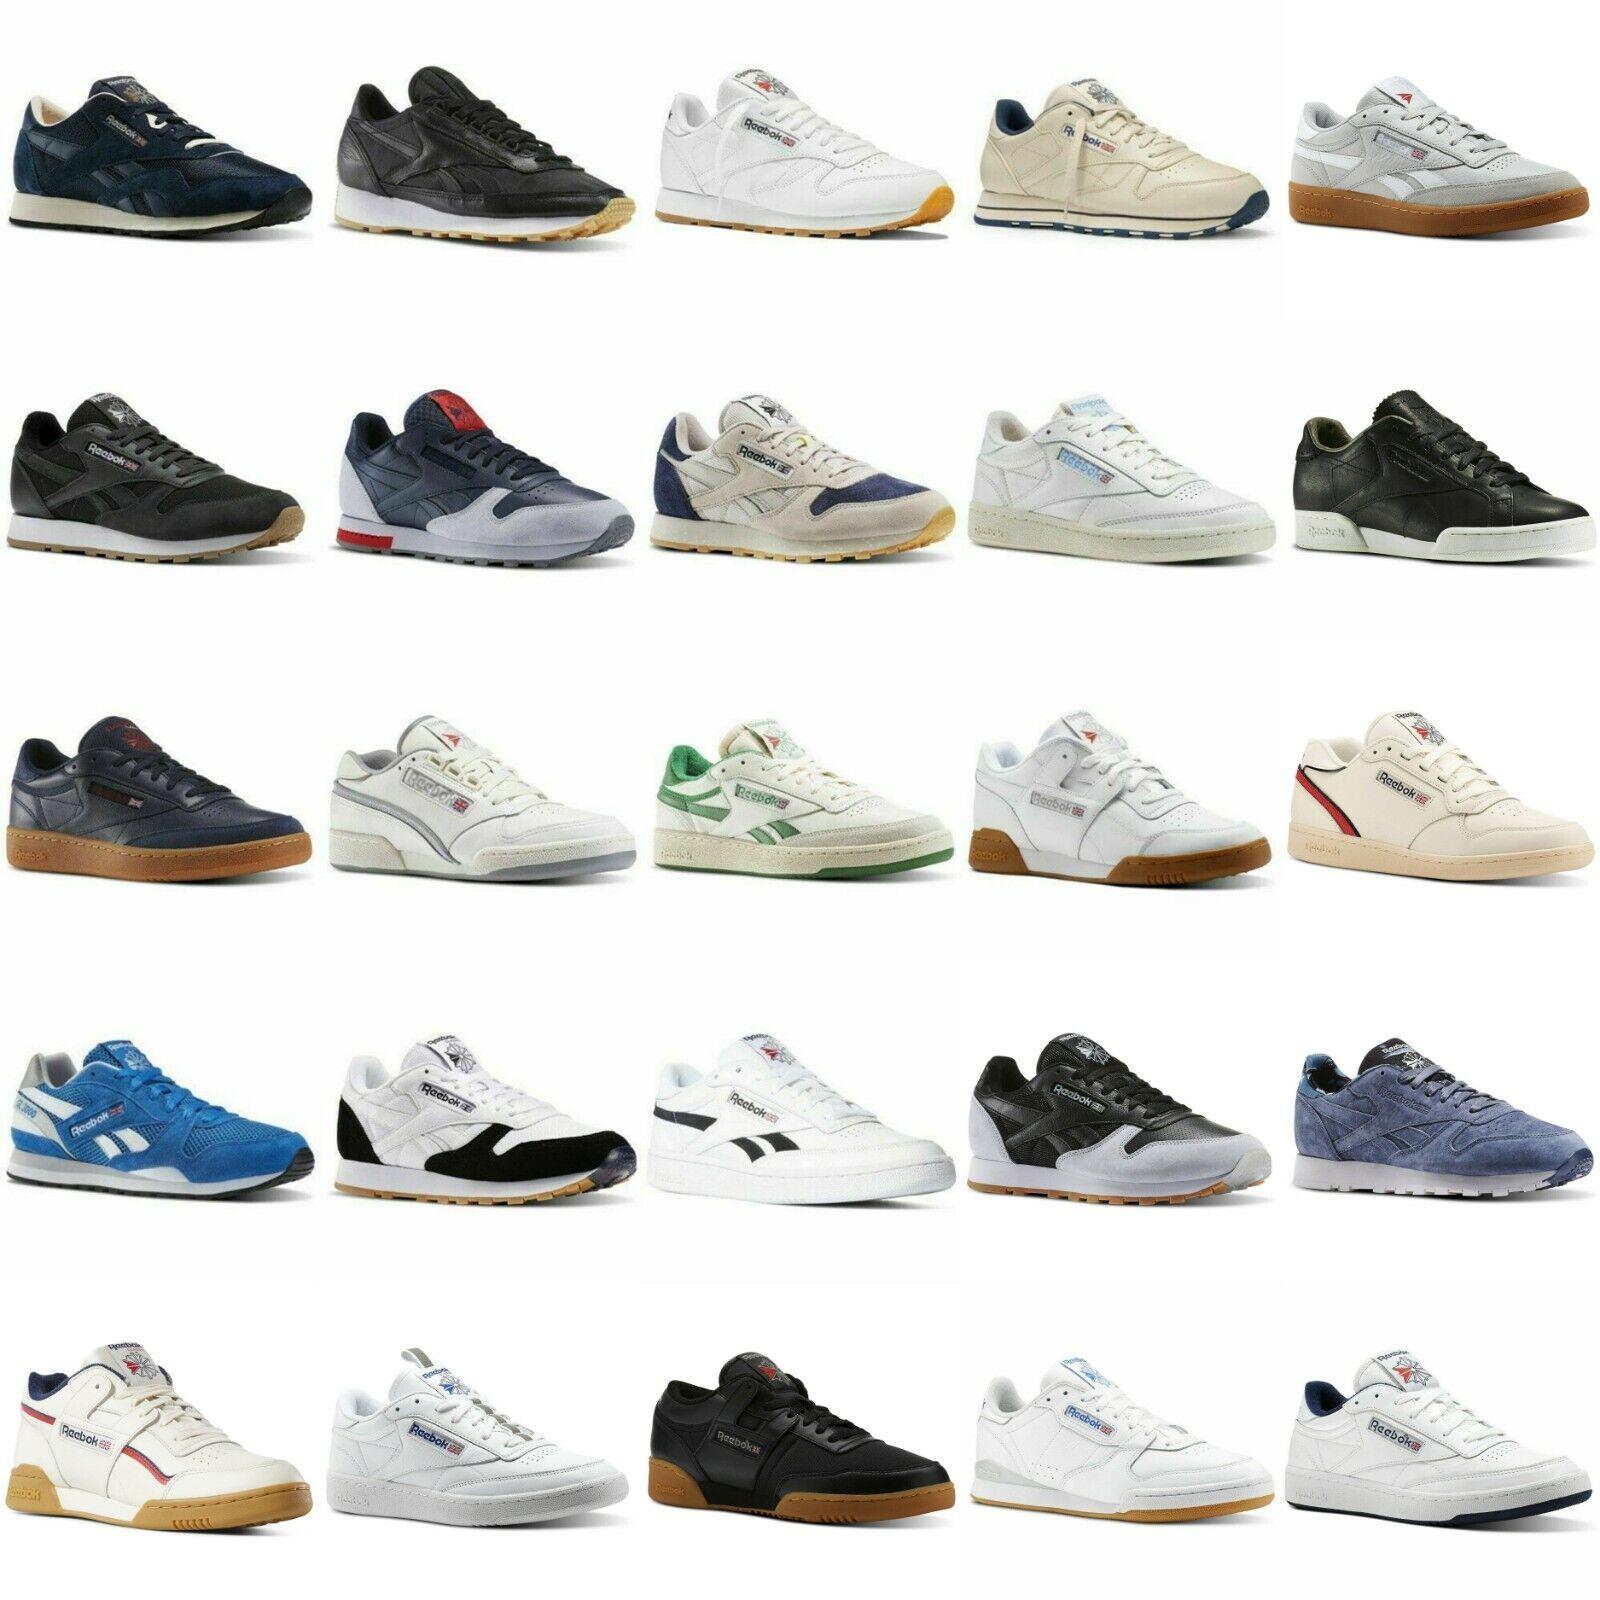 womens adidas samba shoes Sale,up to 64% Discounts